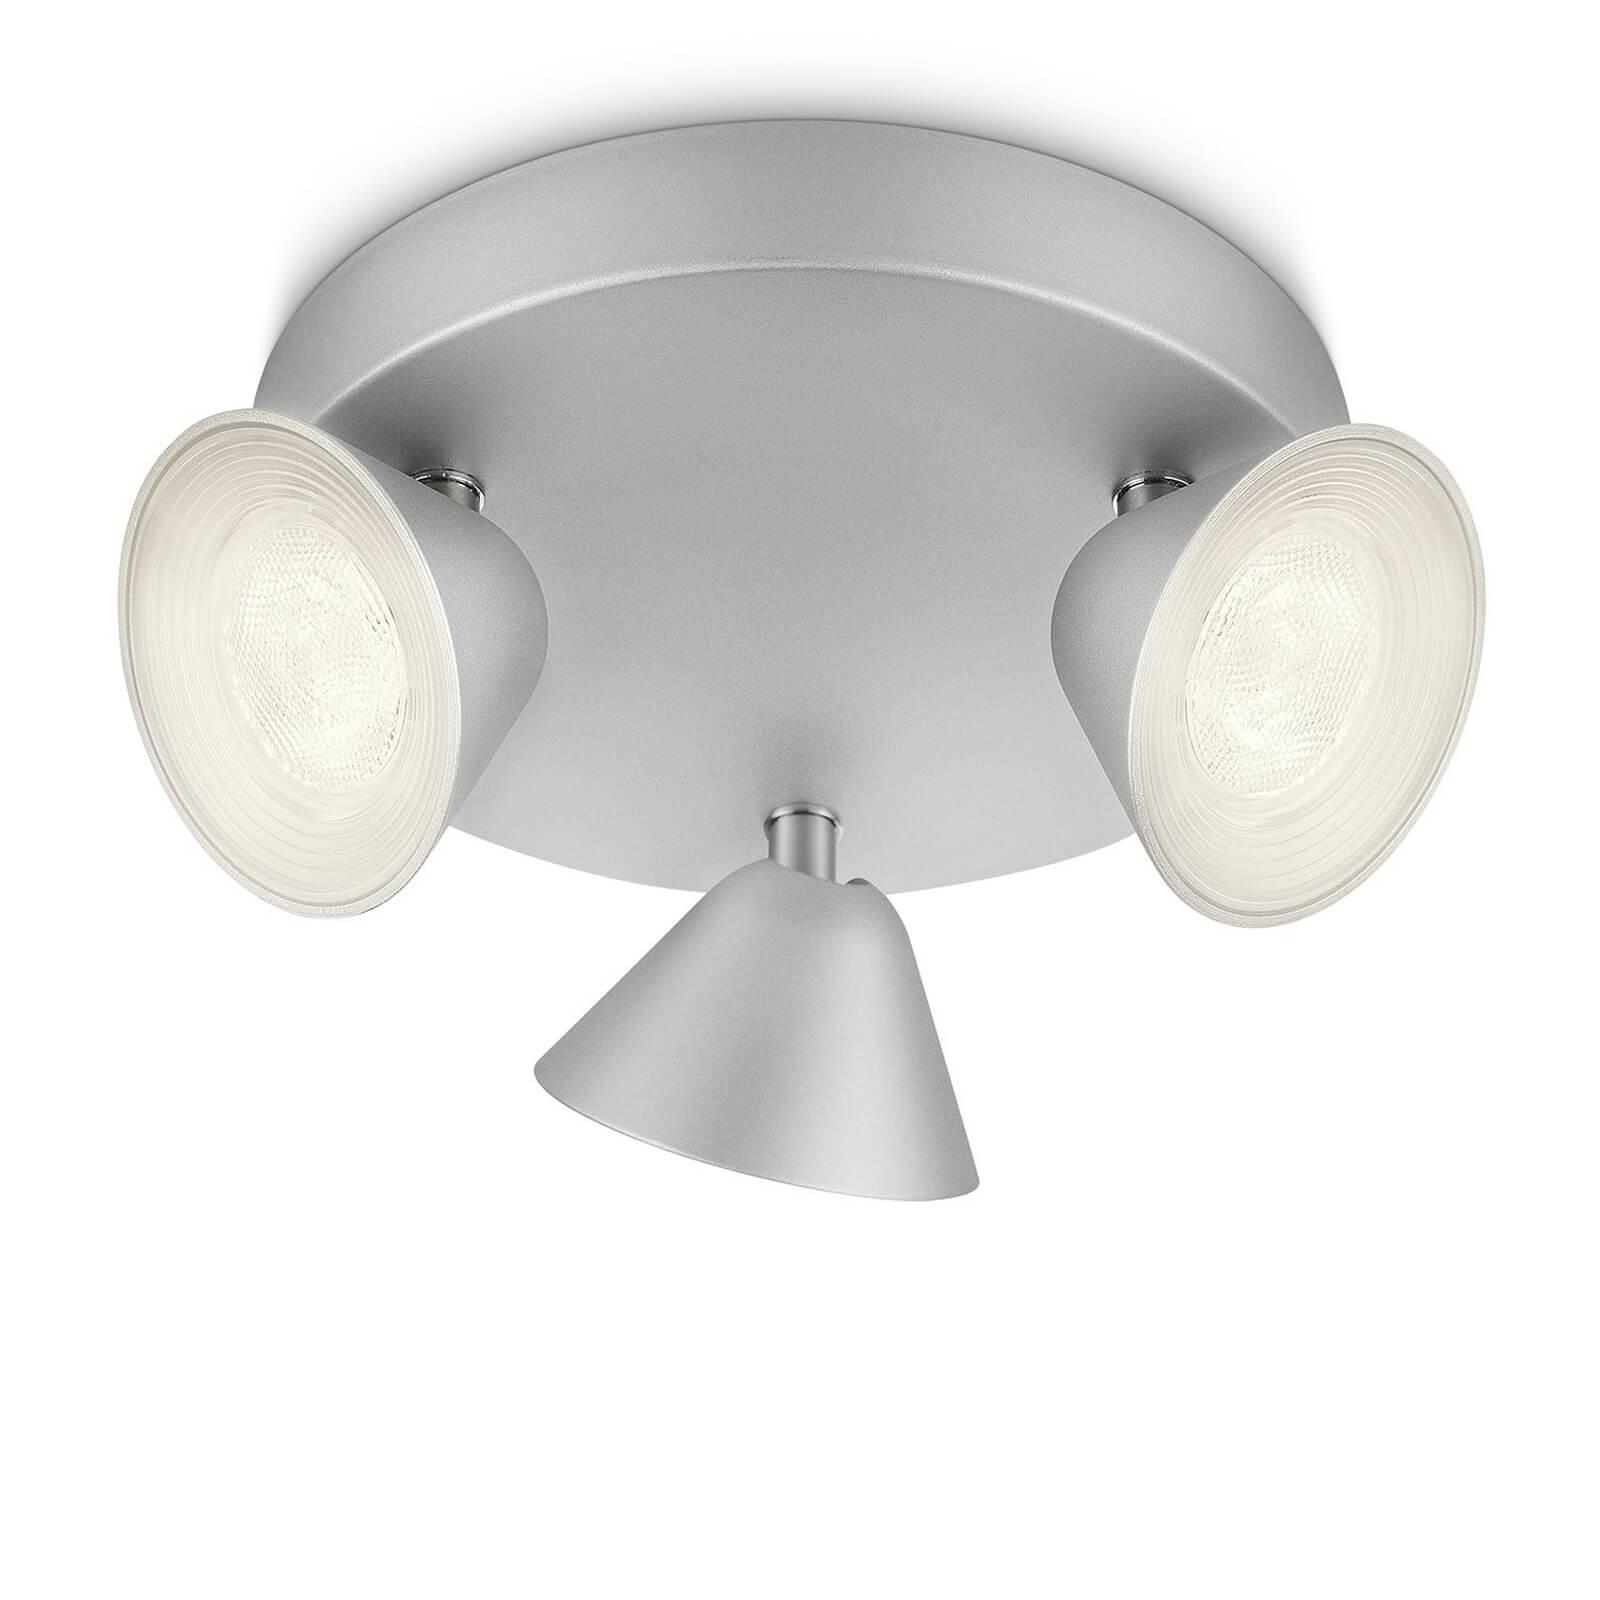 philips myliving tweed spot aluminium 3 spots. Black Bedroom Furniture Sets. Home Design Ideas